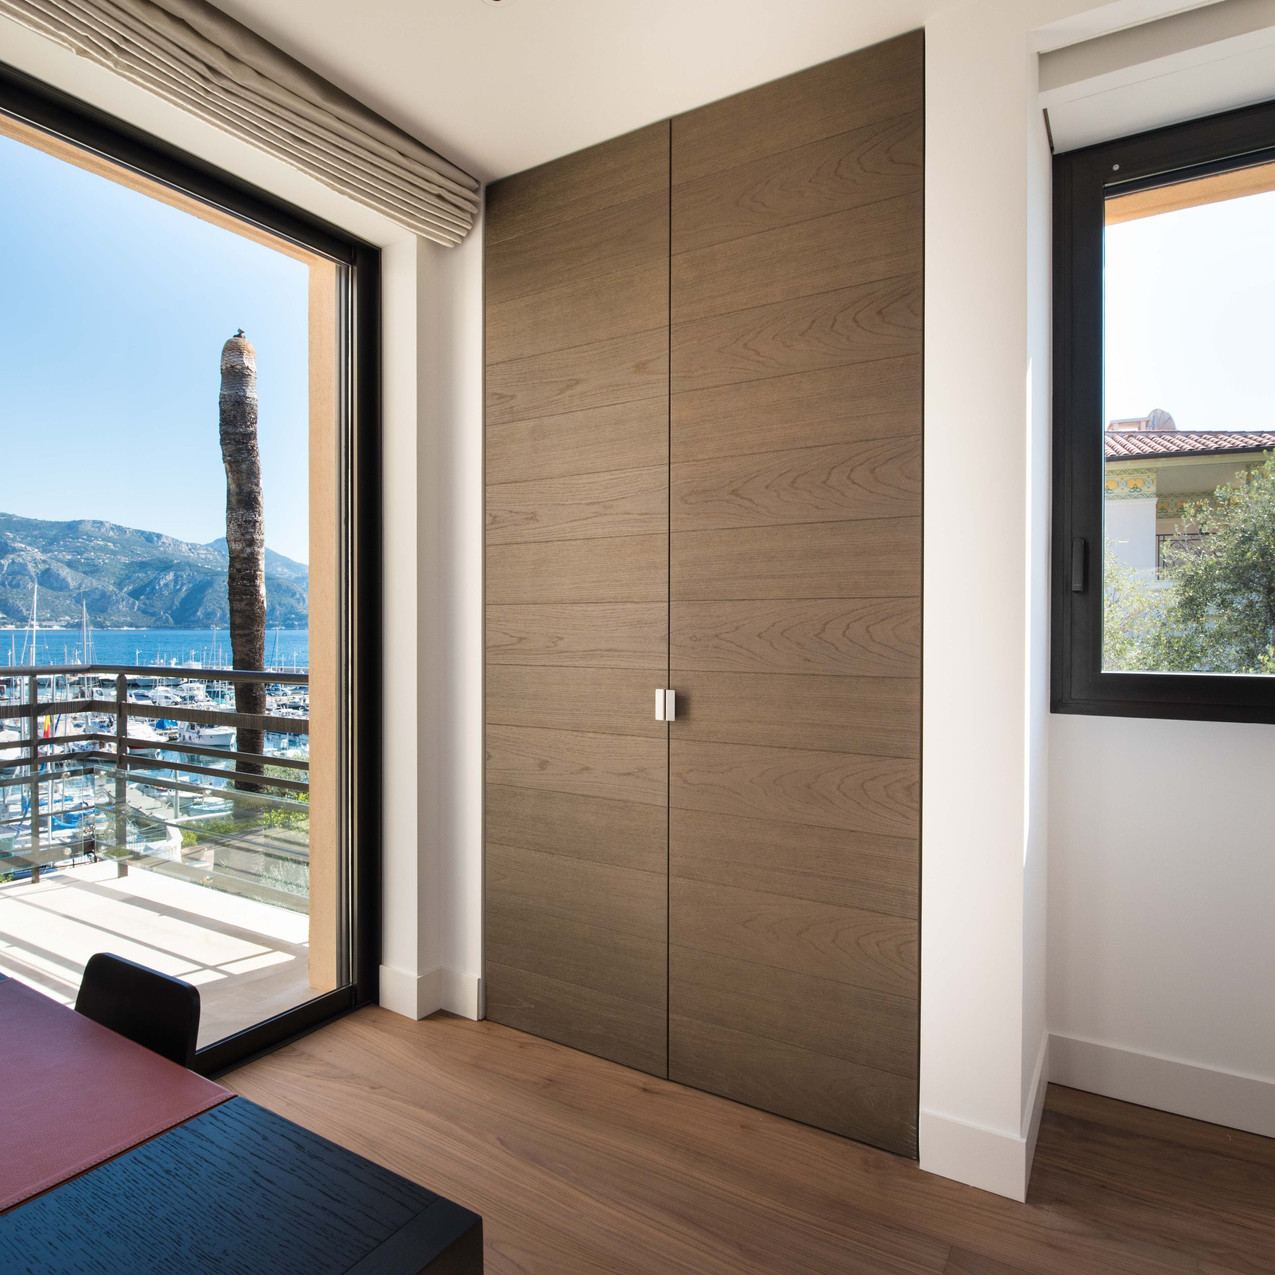 photographe architecture nice france french riviera paca cote dazur interieur-5